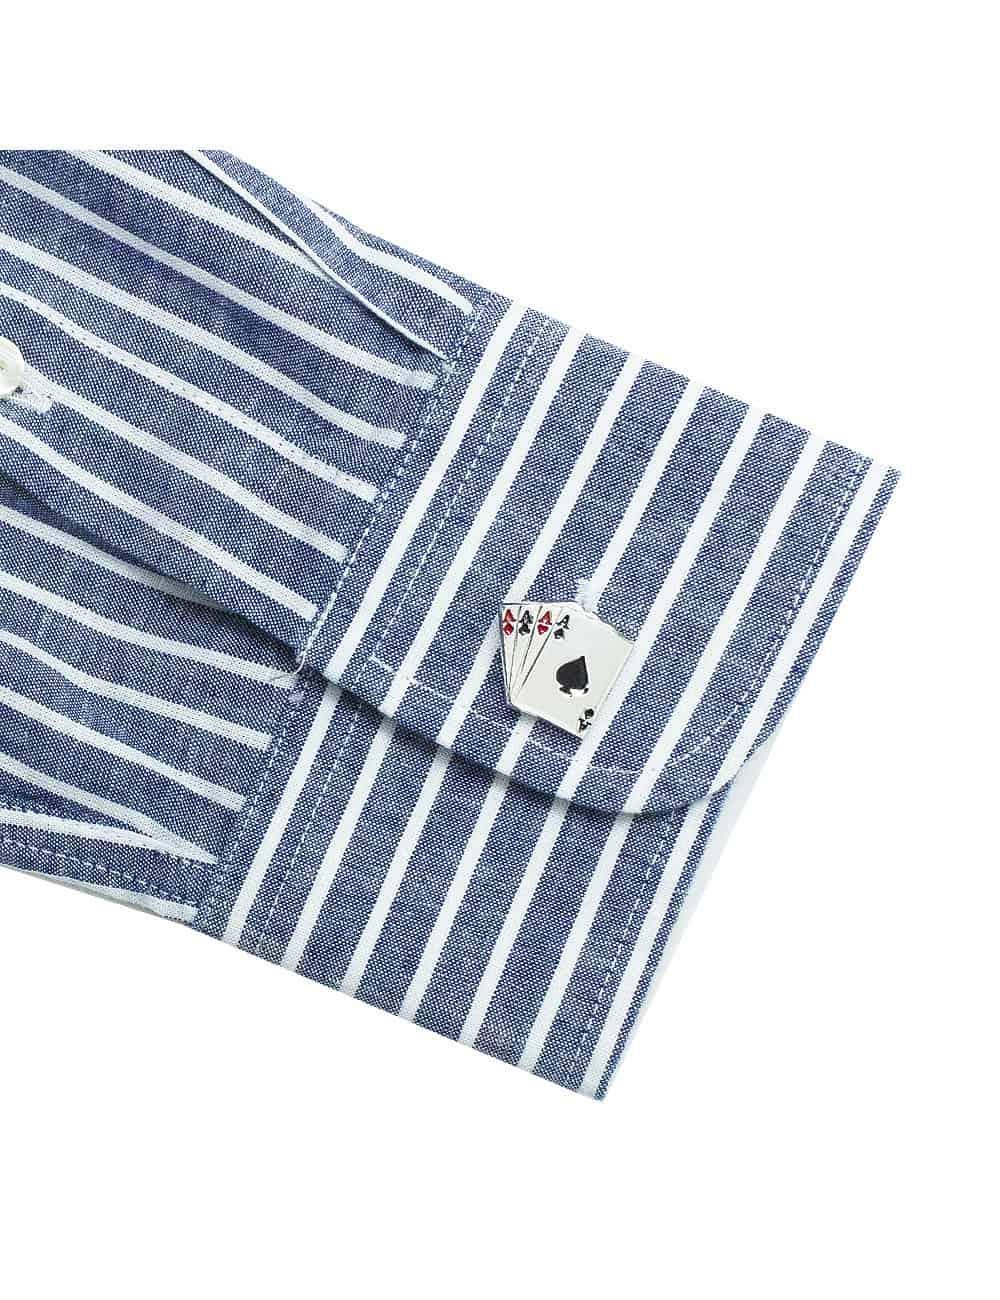 RF Navy with White Stripes Denim Collection 100% Cotton Long Sleeve Single Cuff Shirt RF2BA17.7